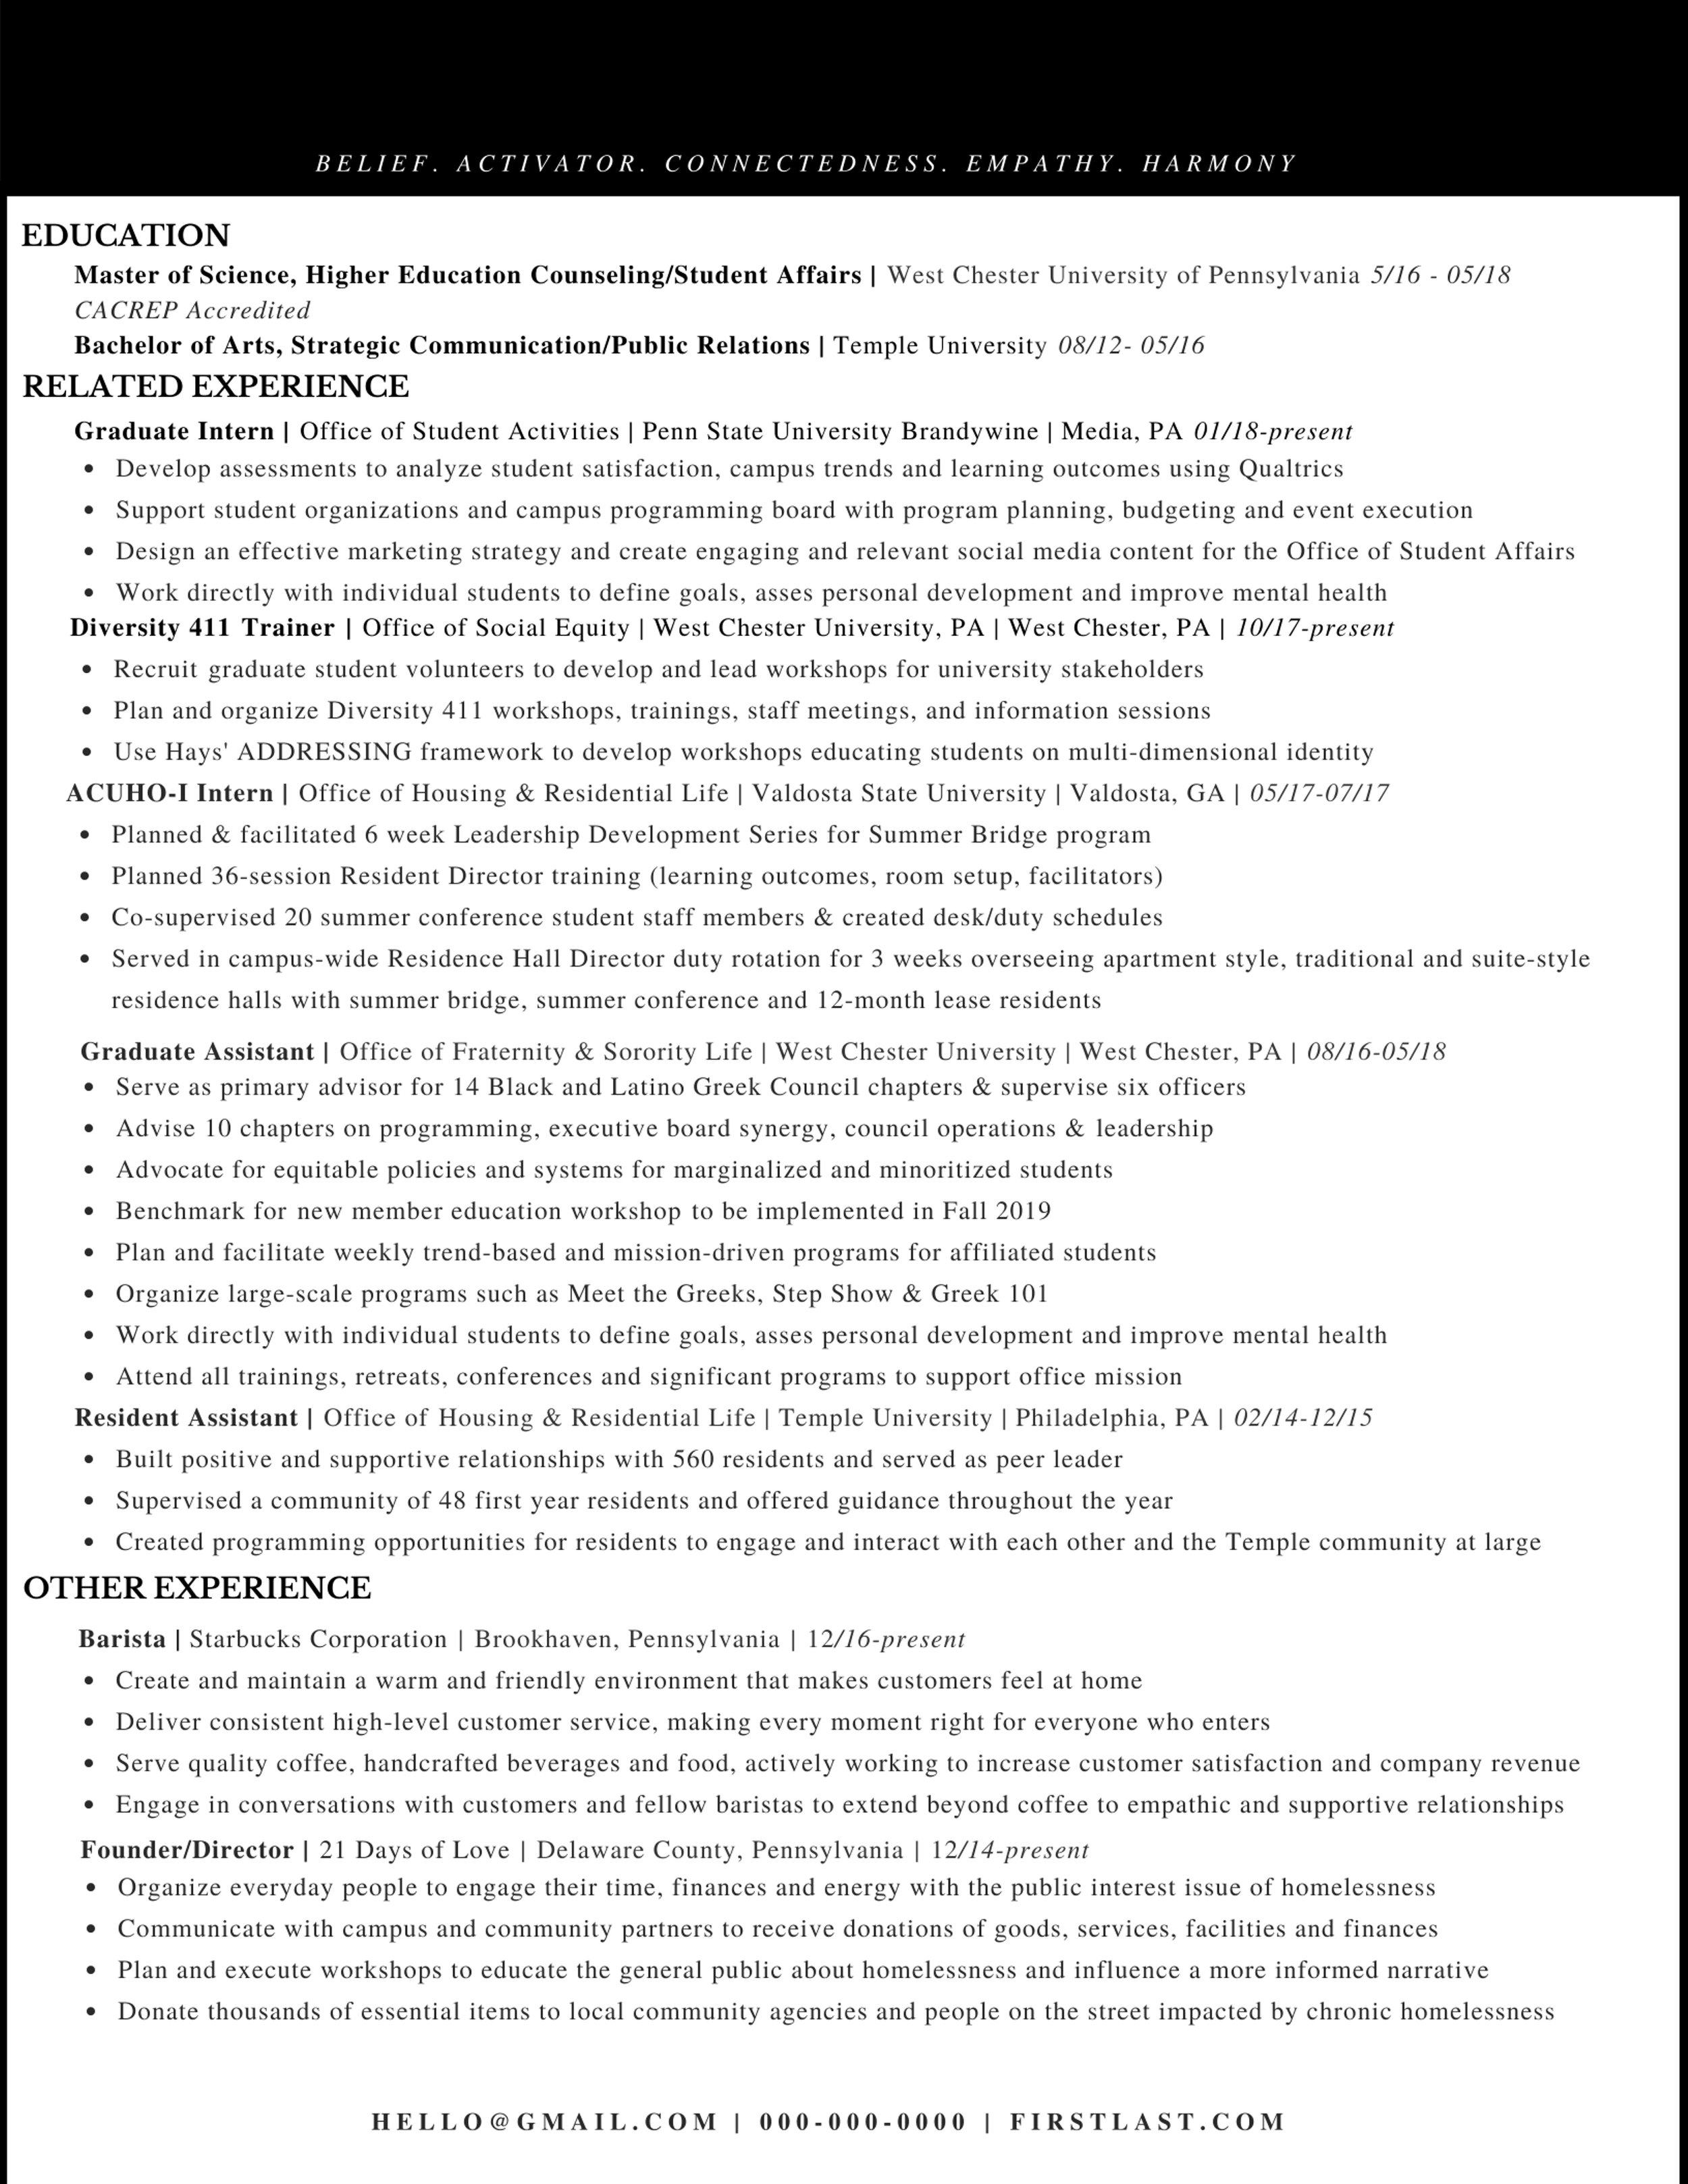 Advanced Resume 1